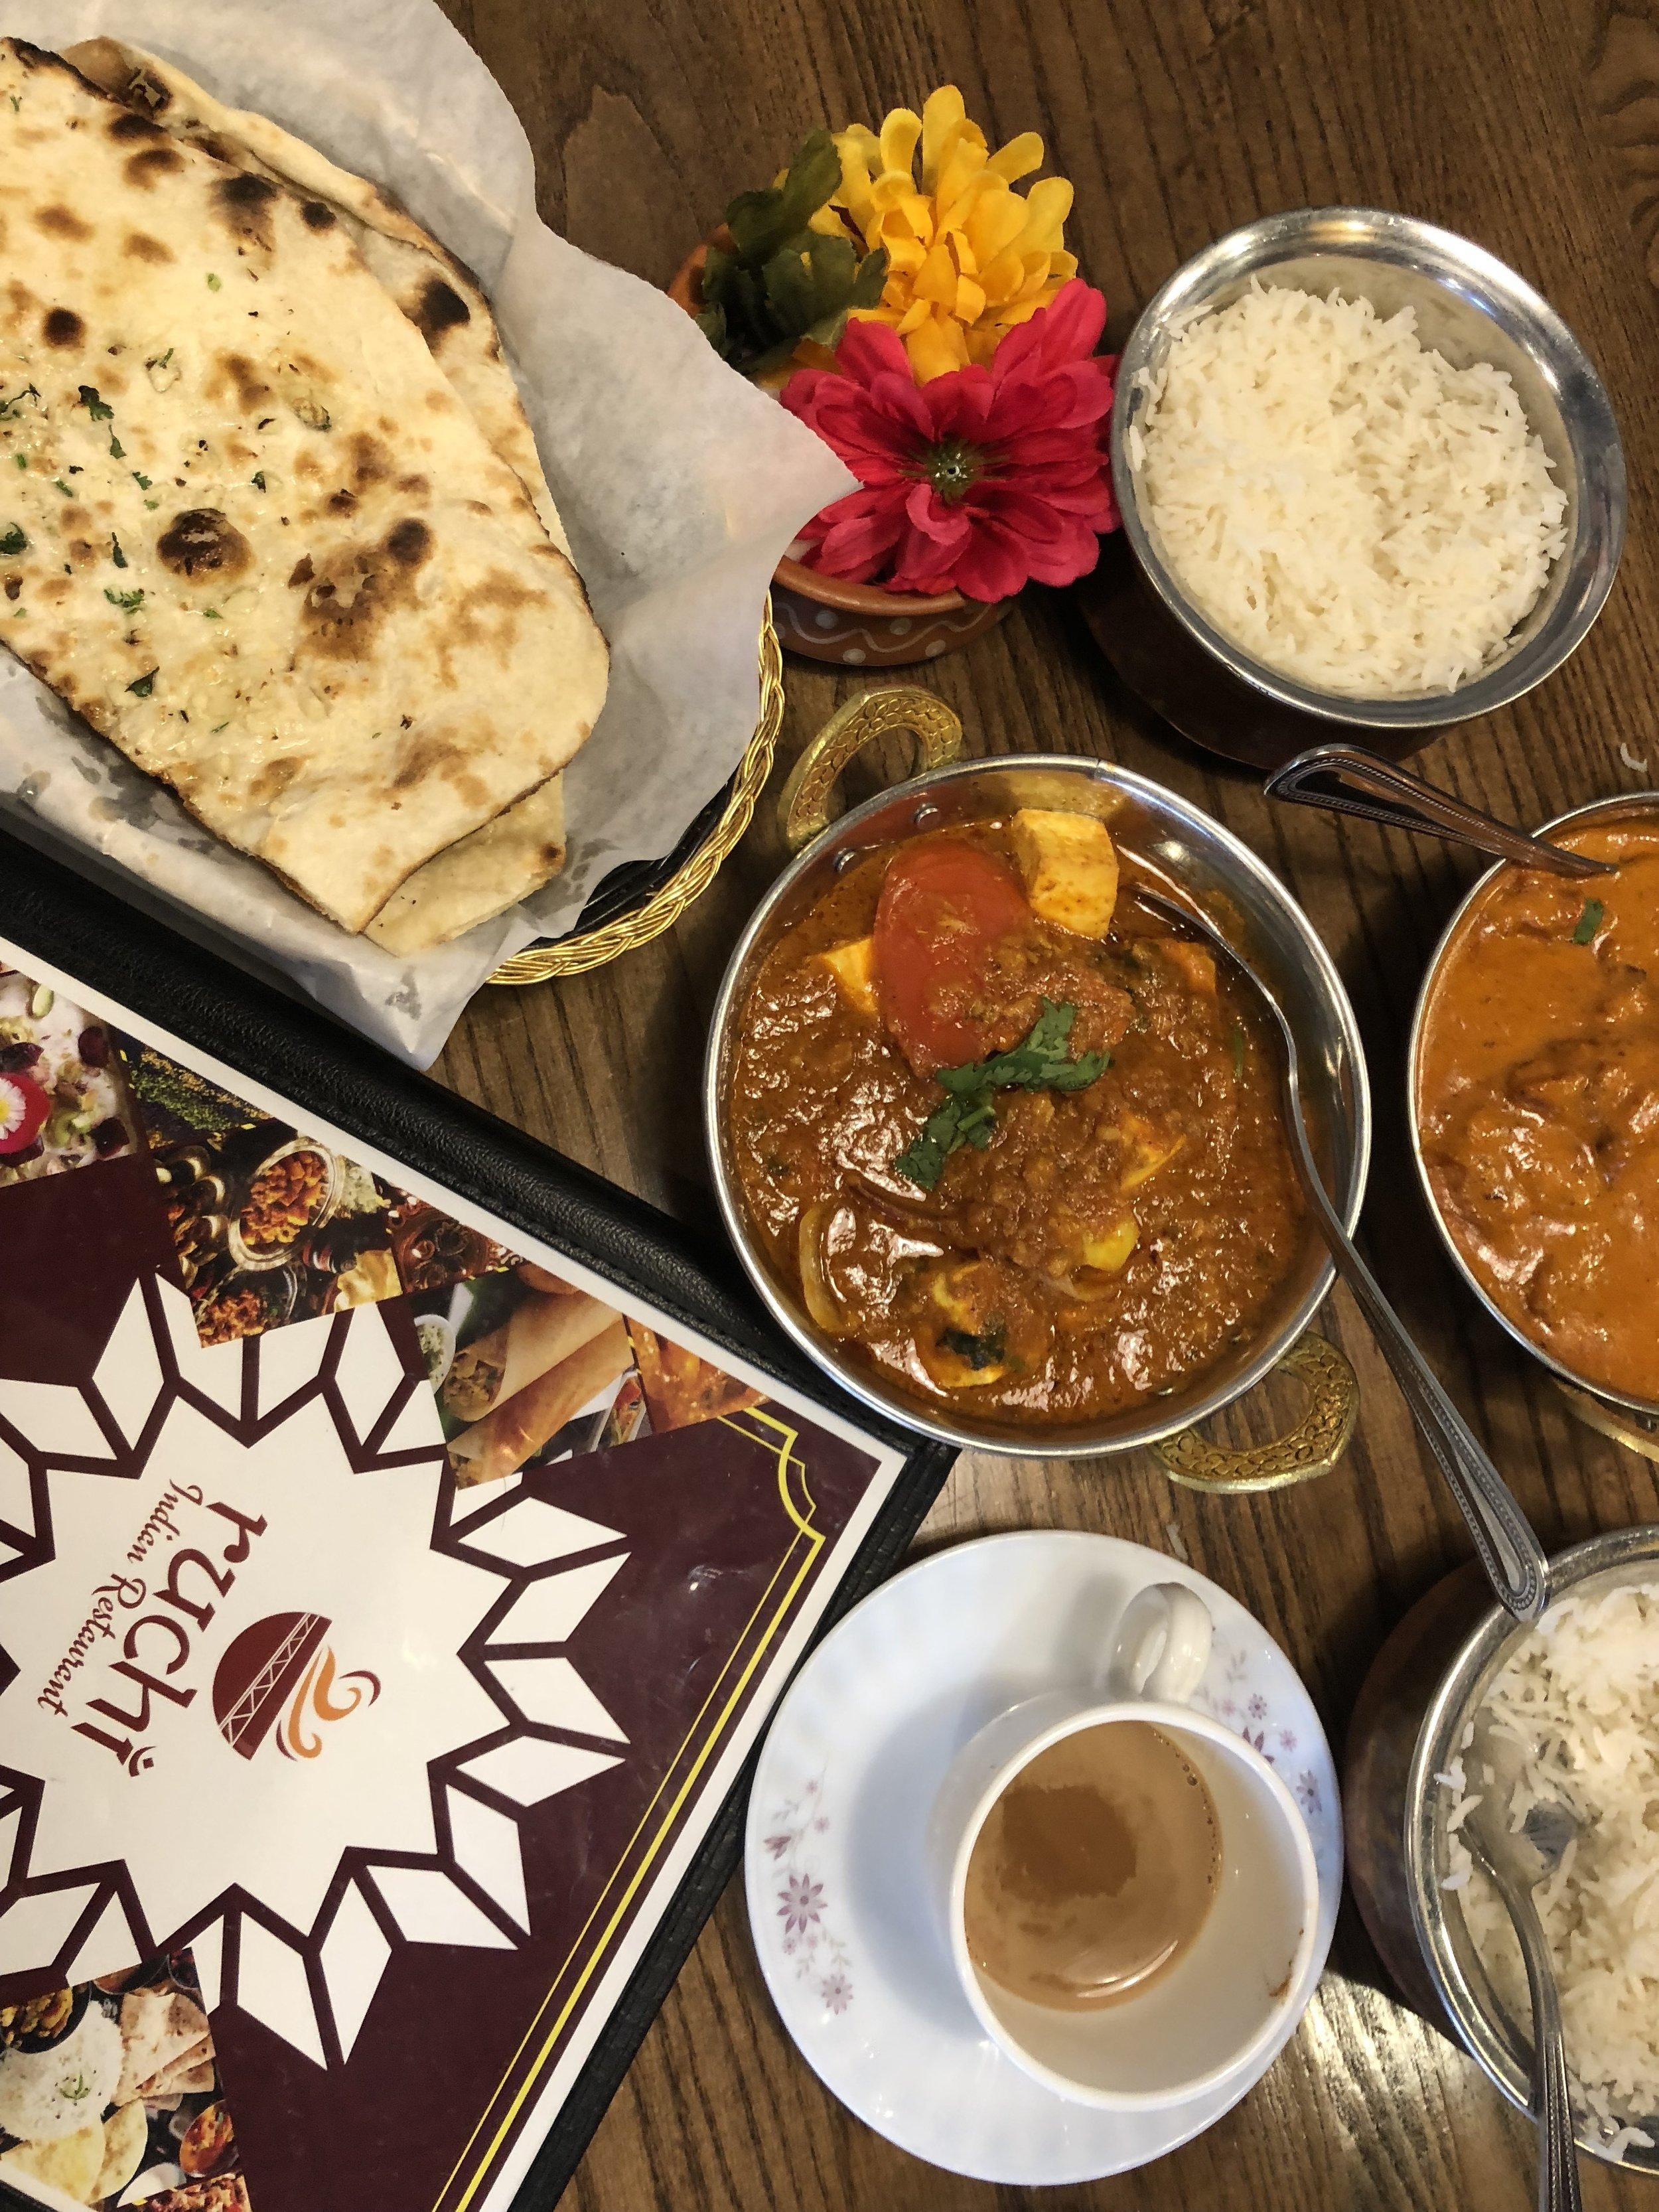 Ruchi Indian Restaurant  Butter Chicken. Paneer (indian cheese). Chai Masala. Naan